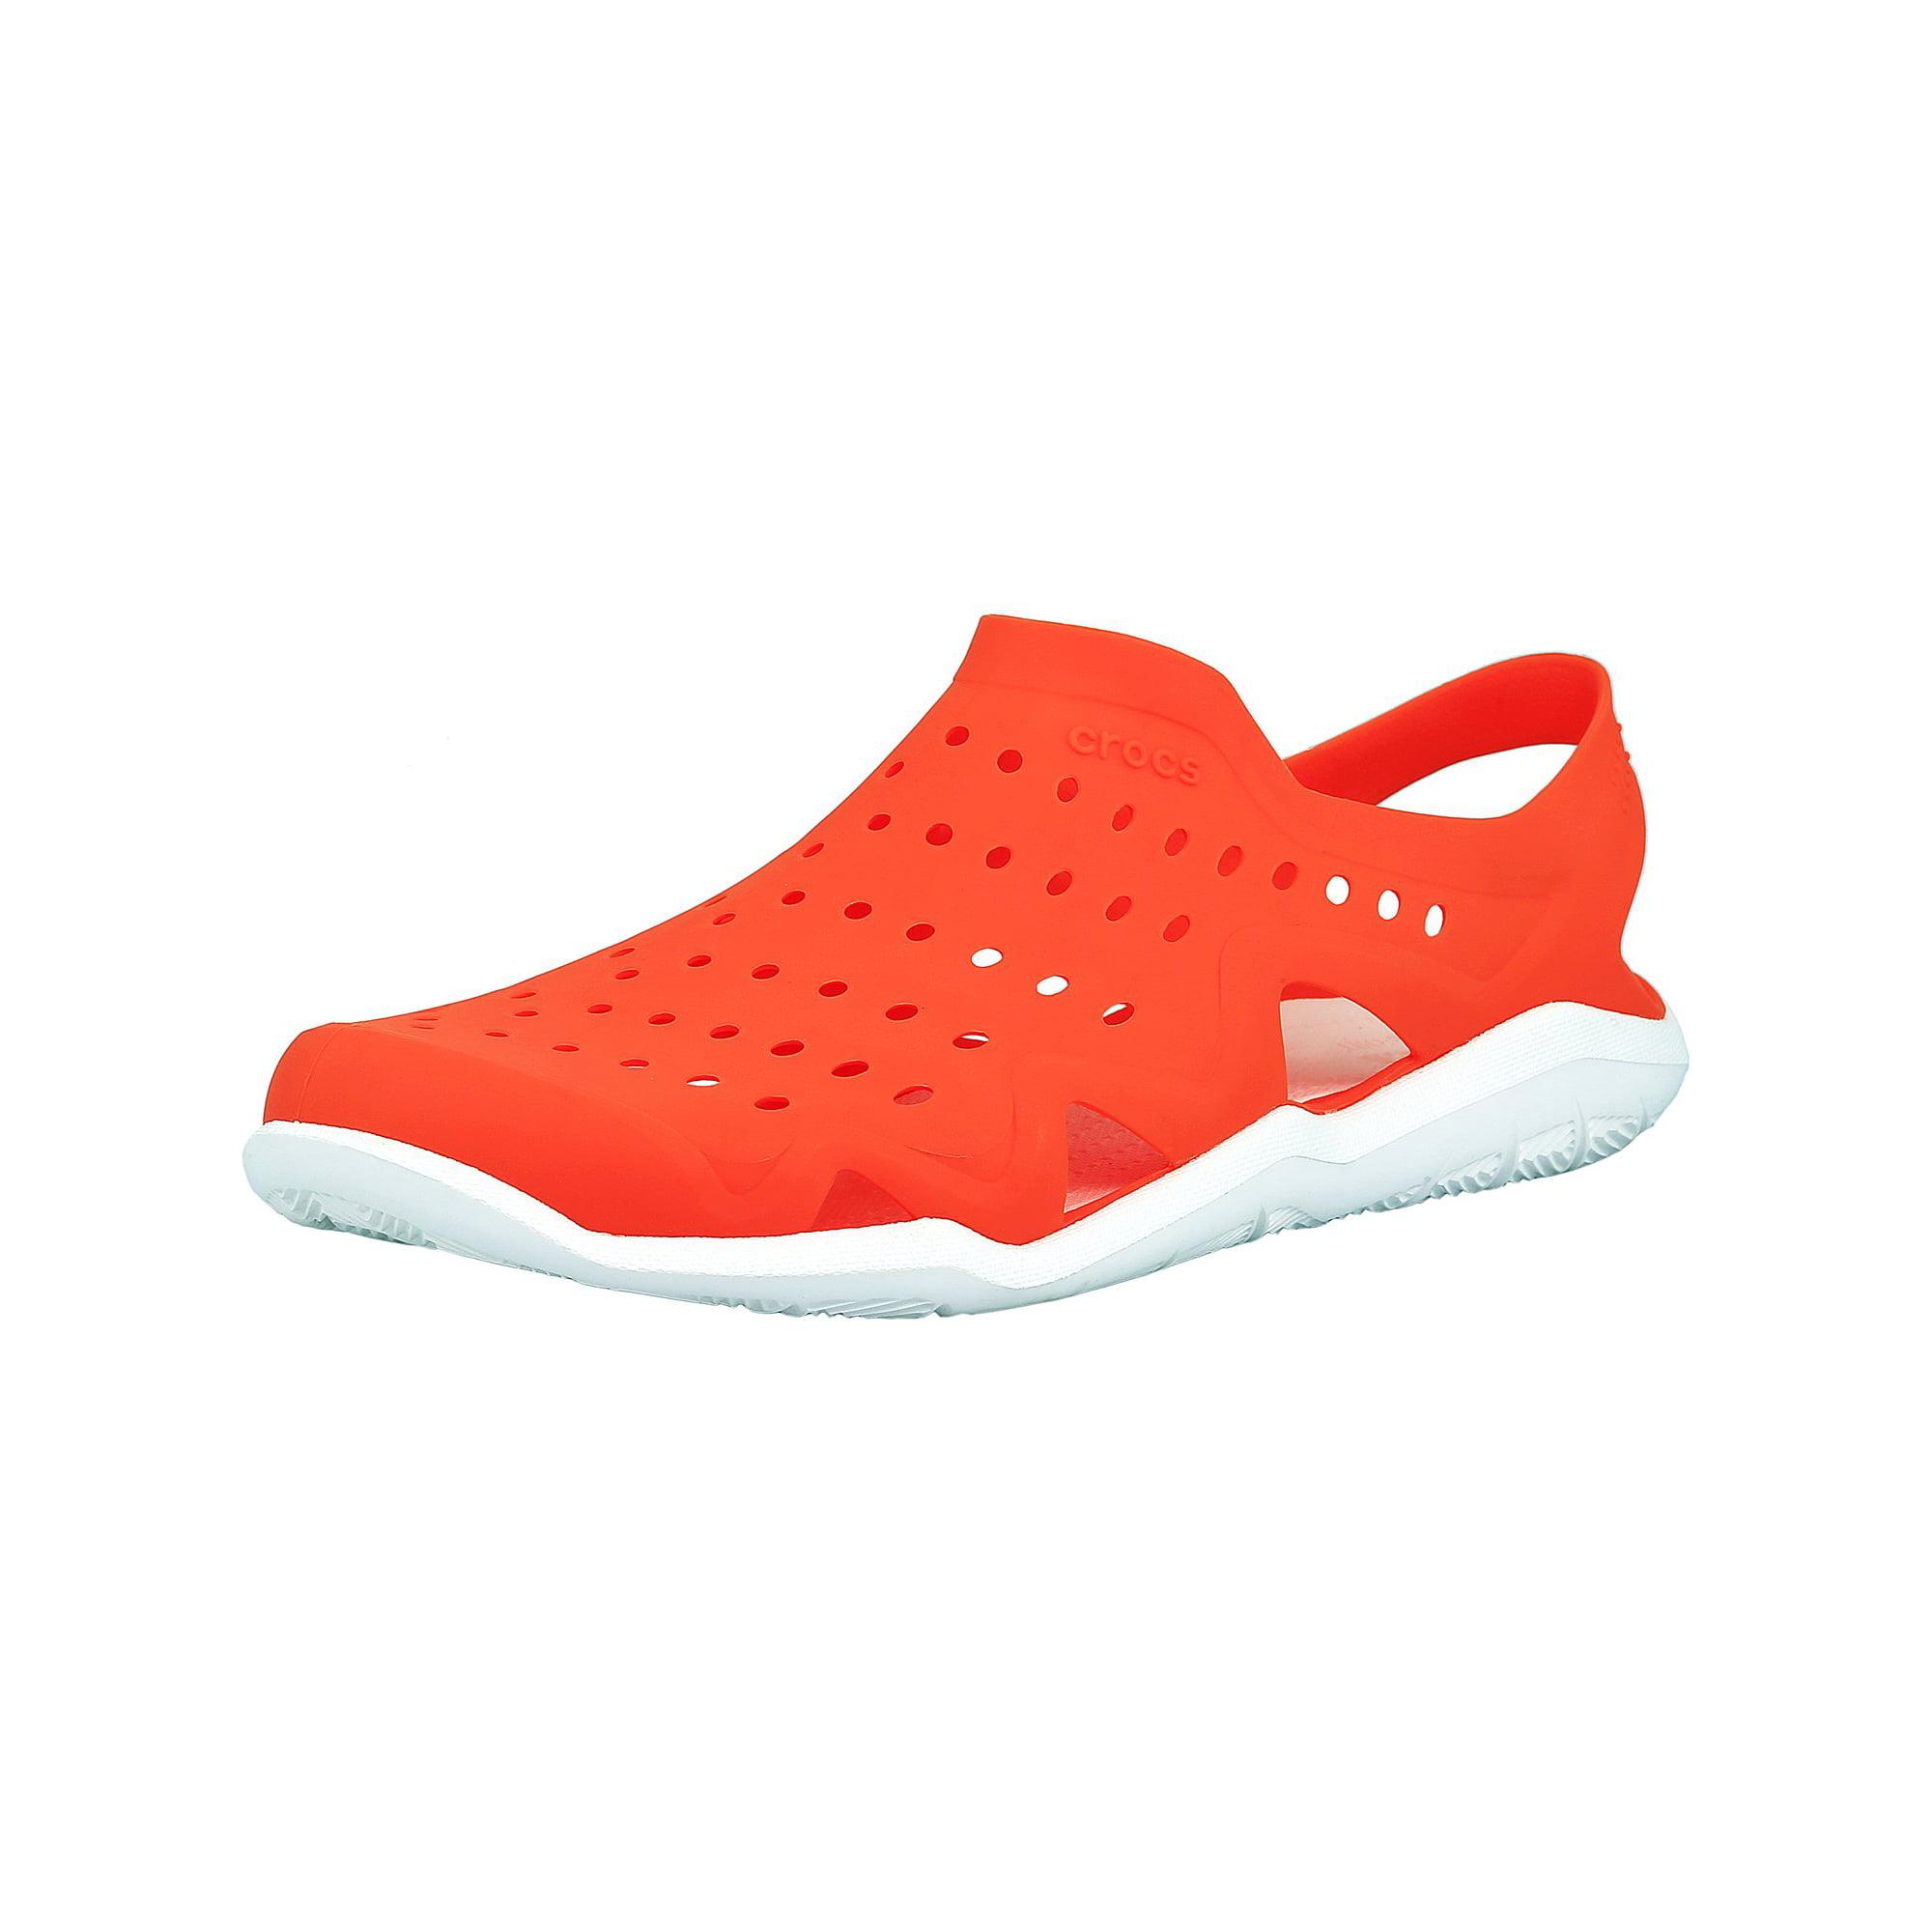 1692f4057d6a Crocs Men s Swiftwater Wave Graphite   Volt Green Ankle-High Rubber Sandal  - 6M